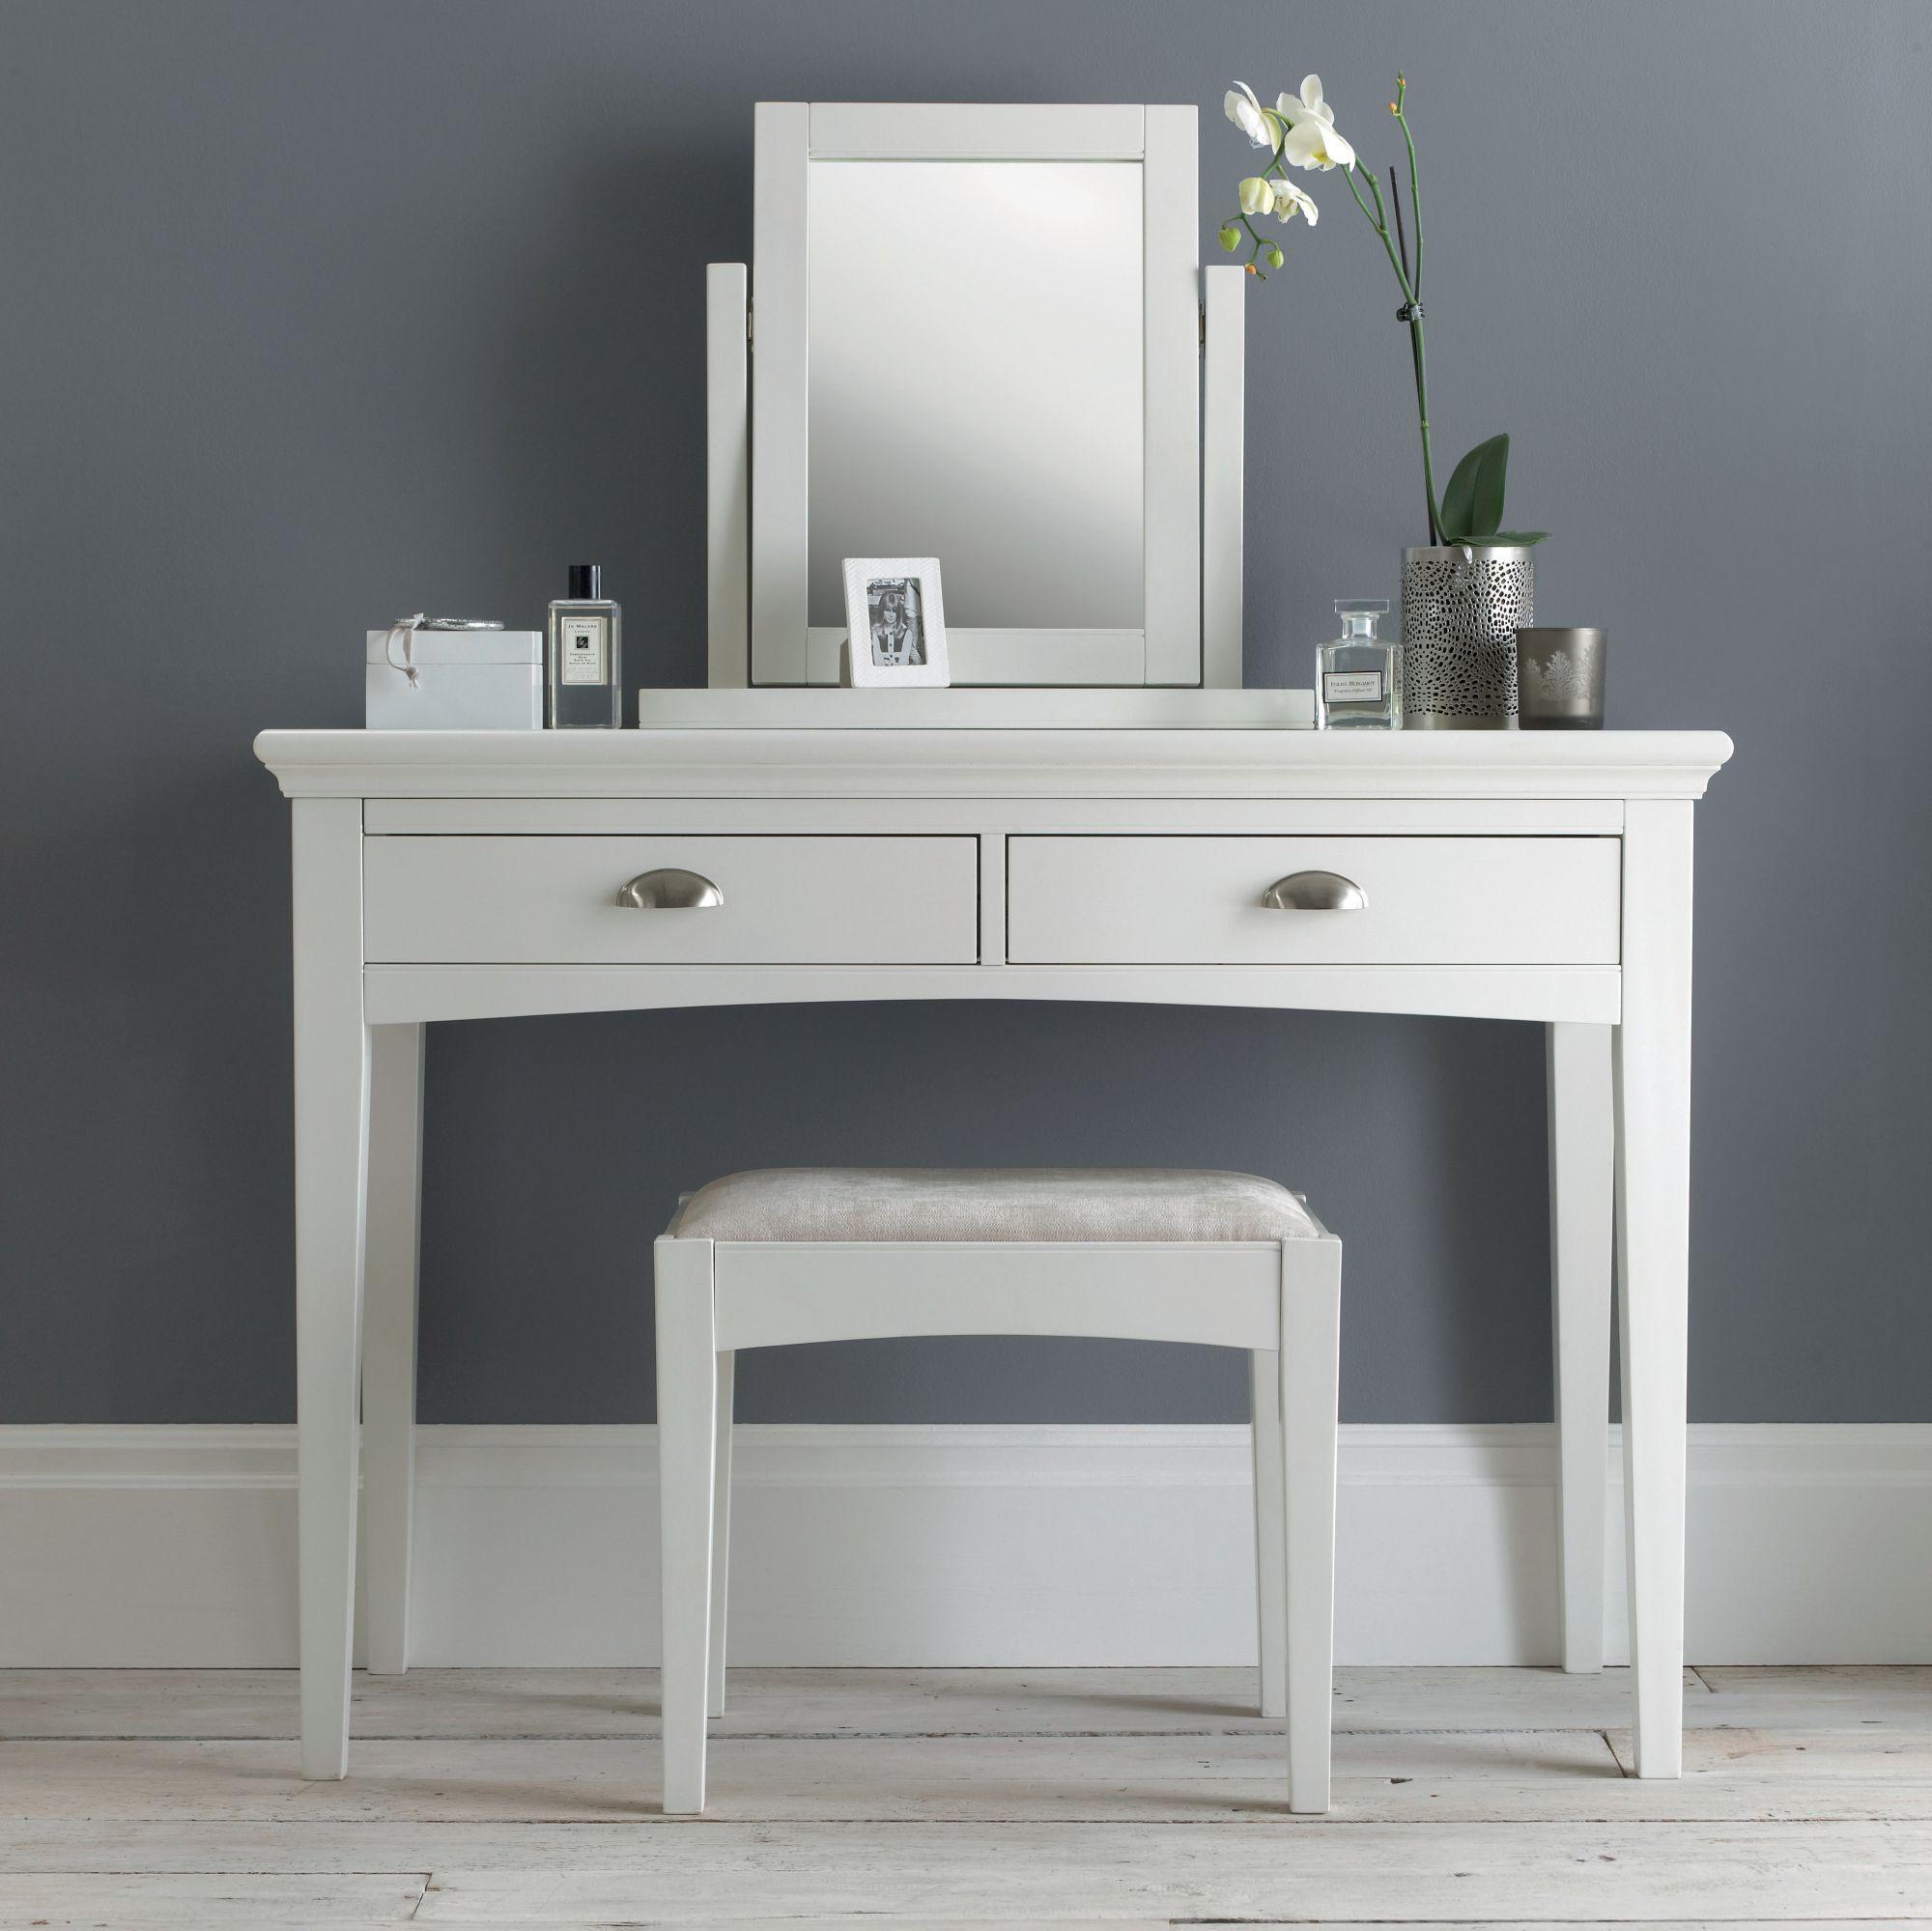 hampstead white dressing table haven furniture. Black Bedroom Furniture Sets. Home Design Ideas